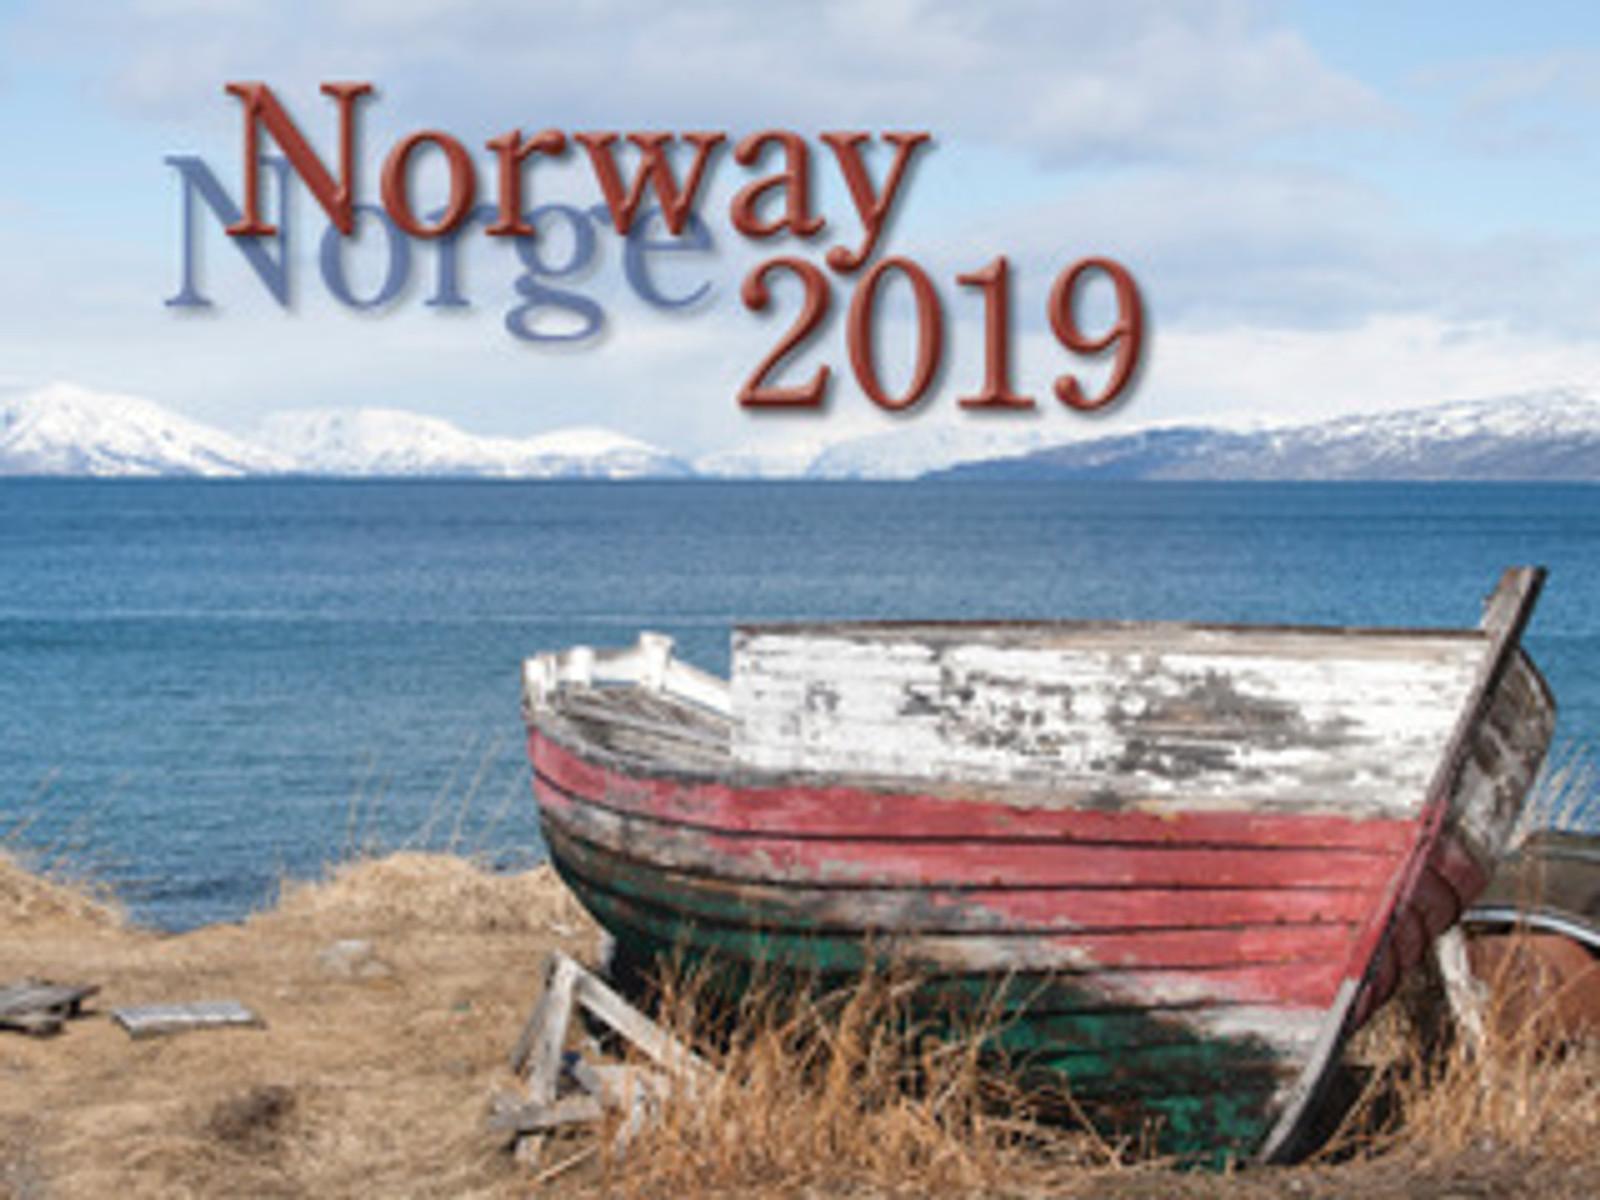 2019 Nordiskal Norway Calendar in Photographs - Front Cover